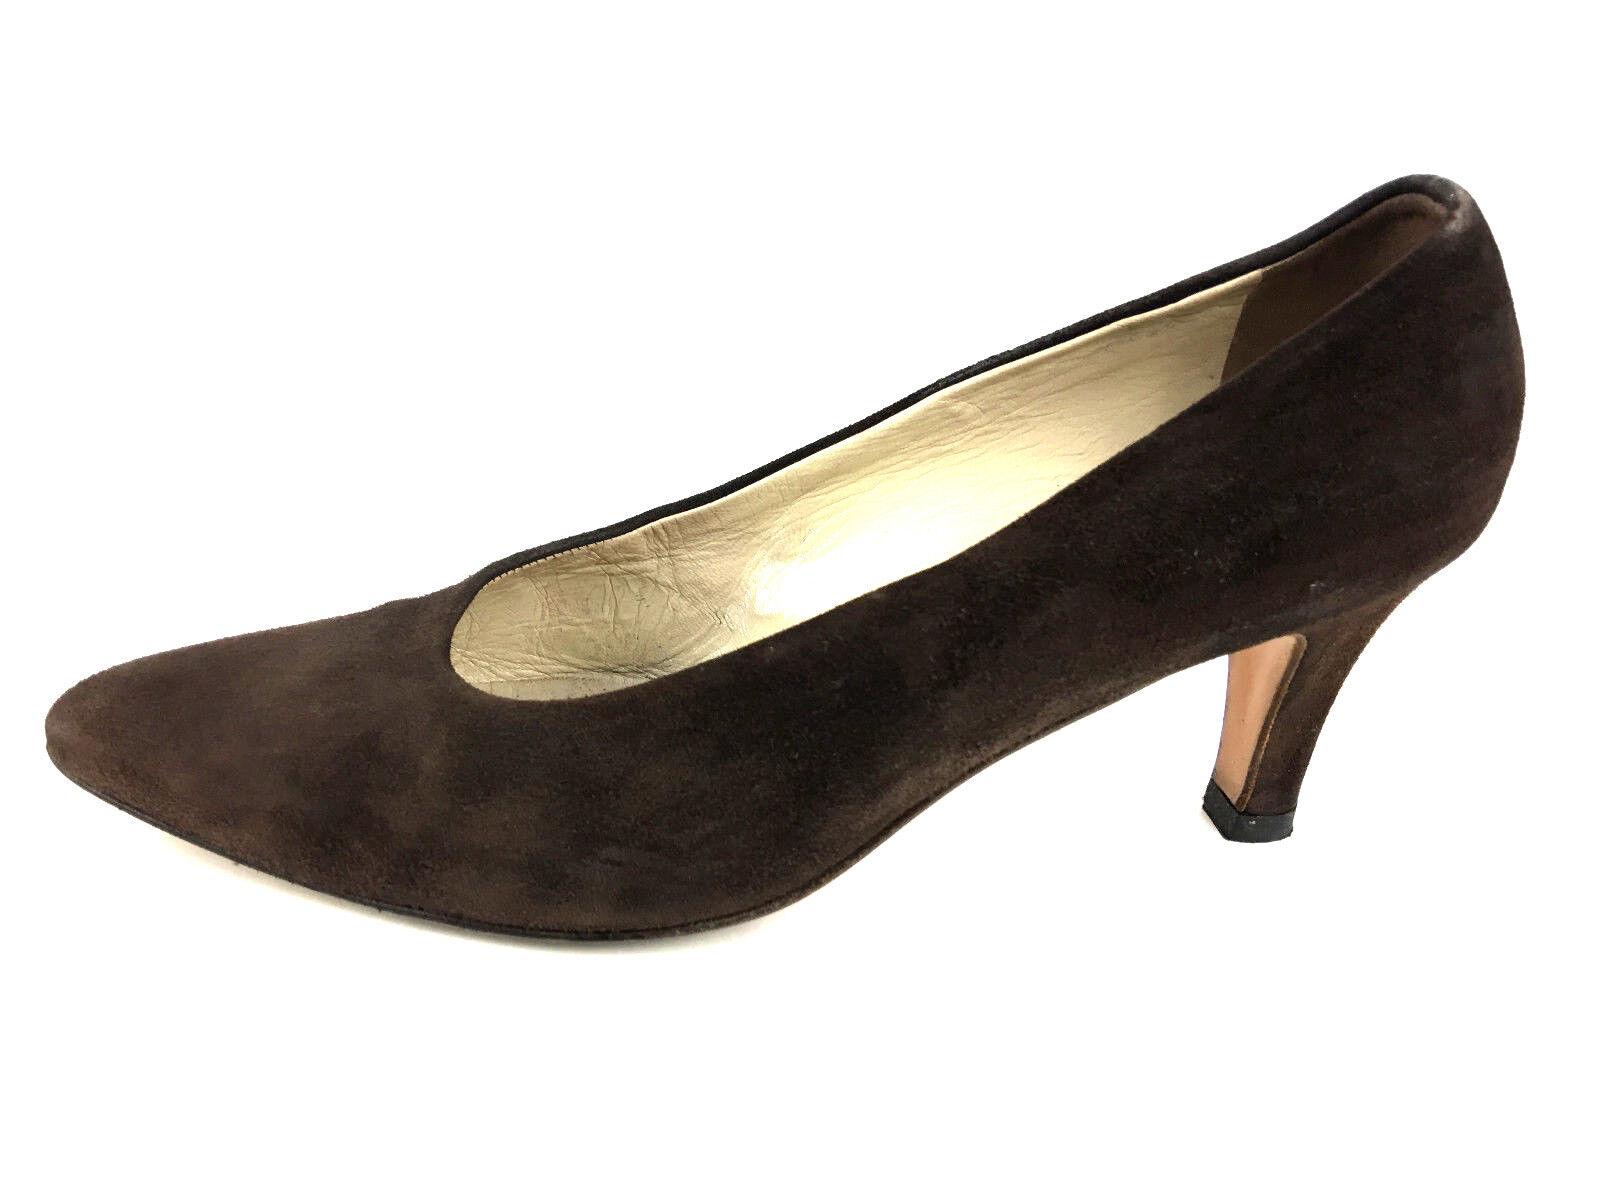 Bally Classic  Damenschuhe Pump Heel Braun  Classic Schuhe Größe US.6 f36b7b